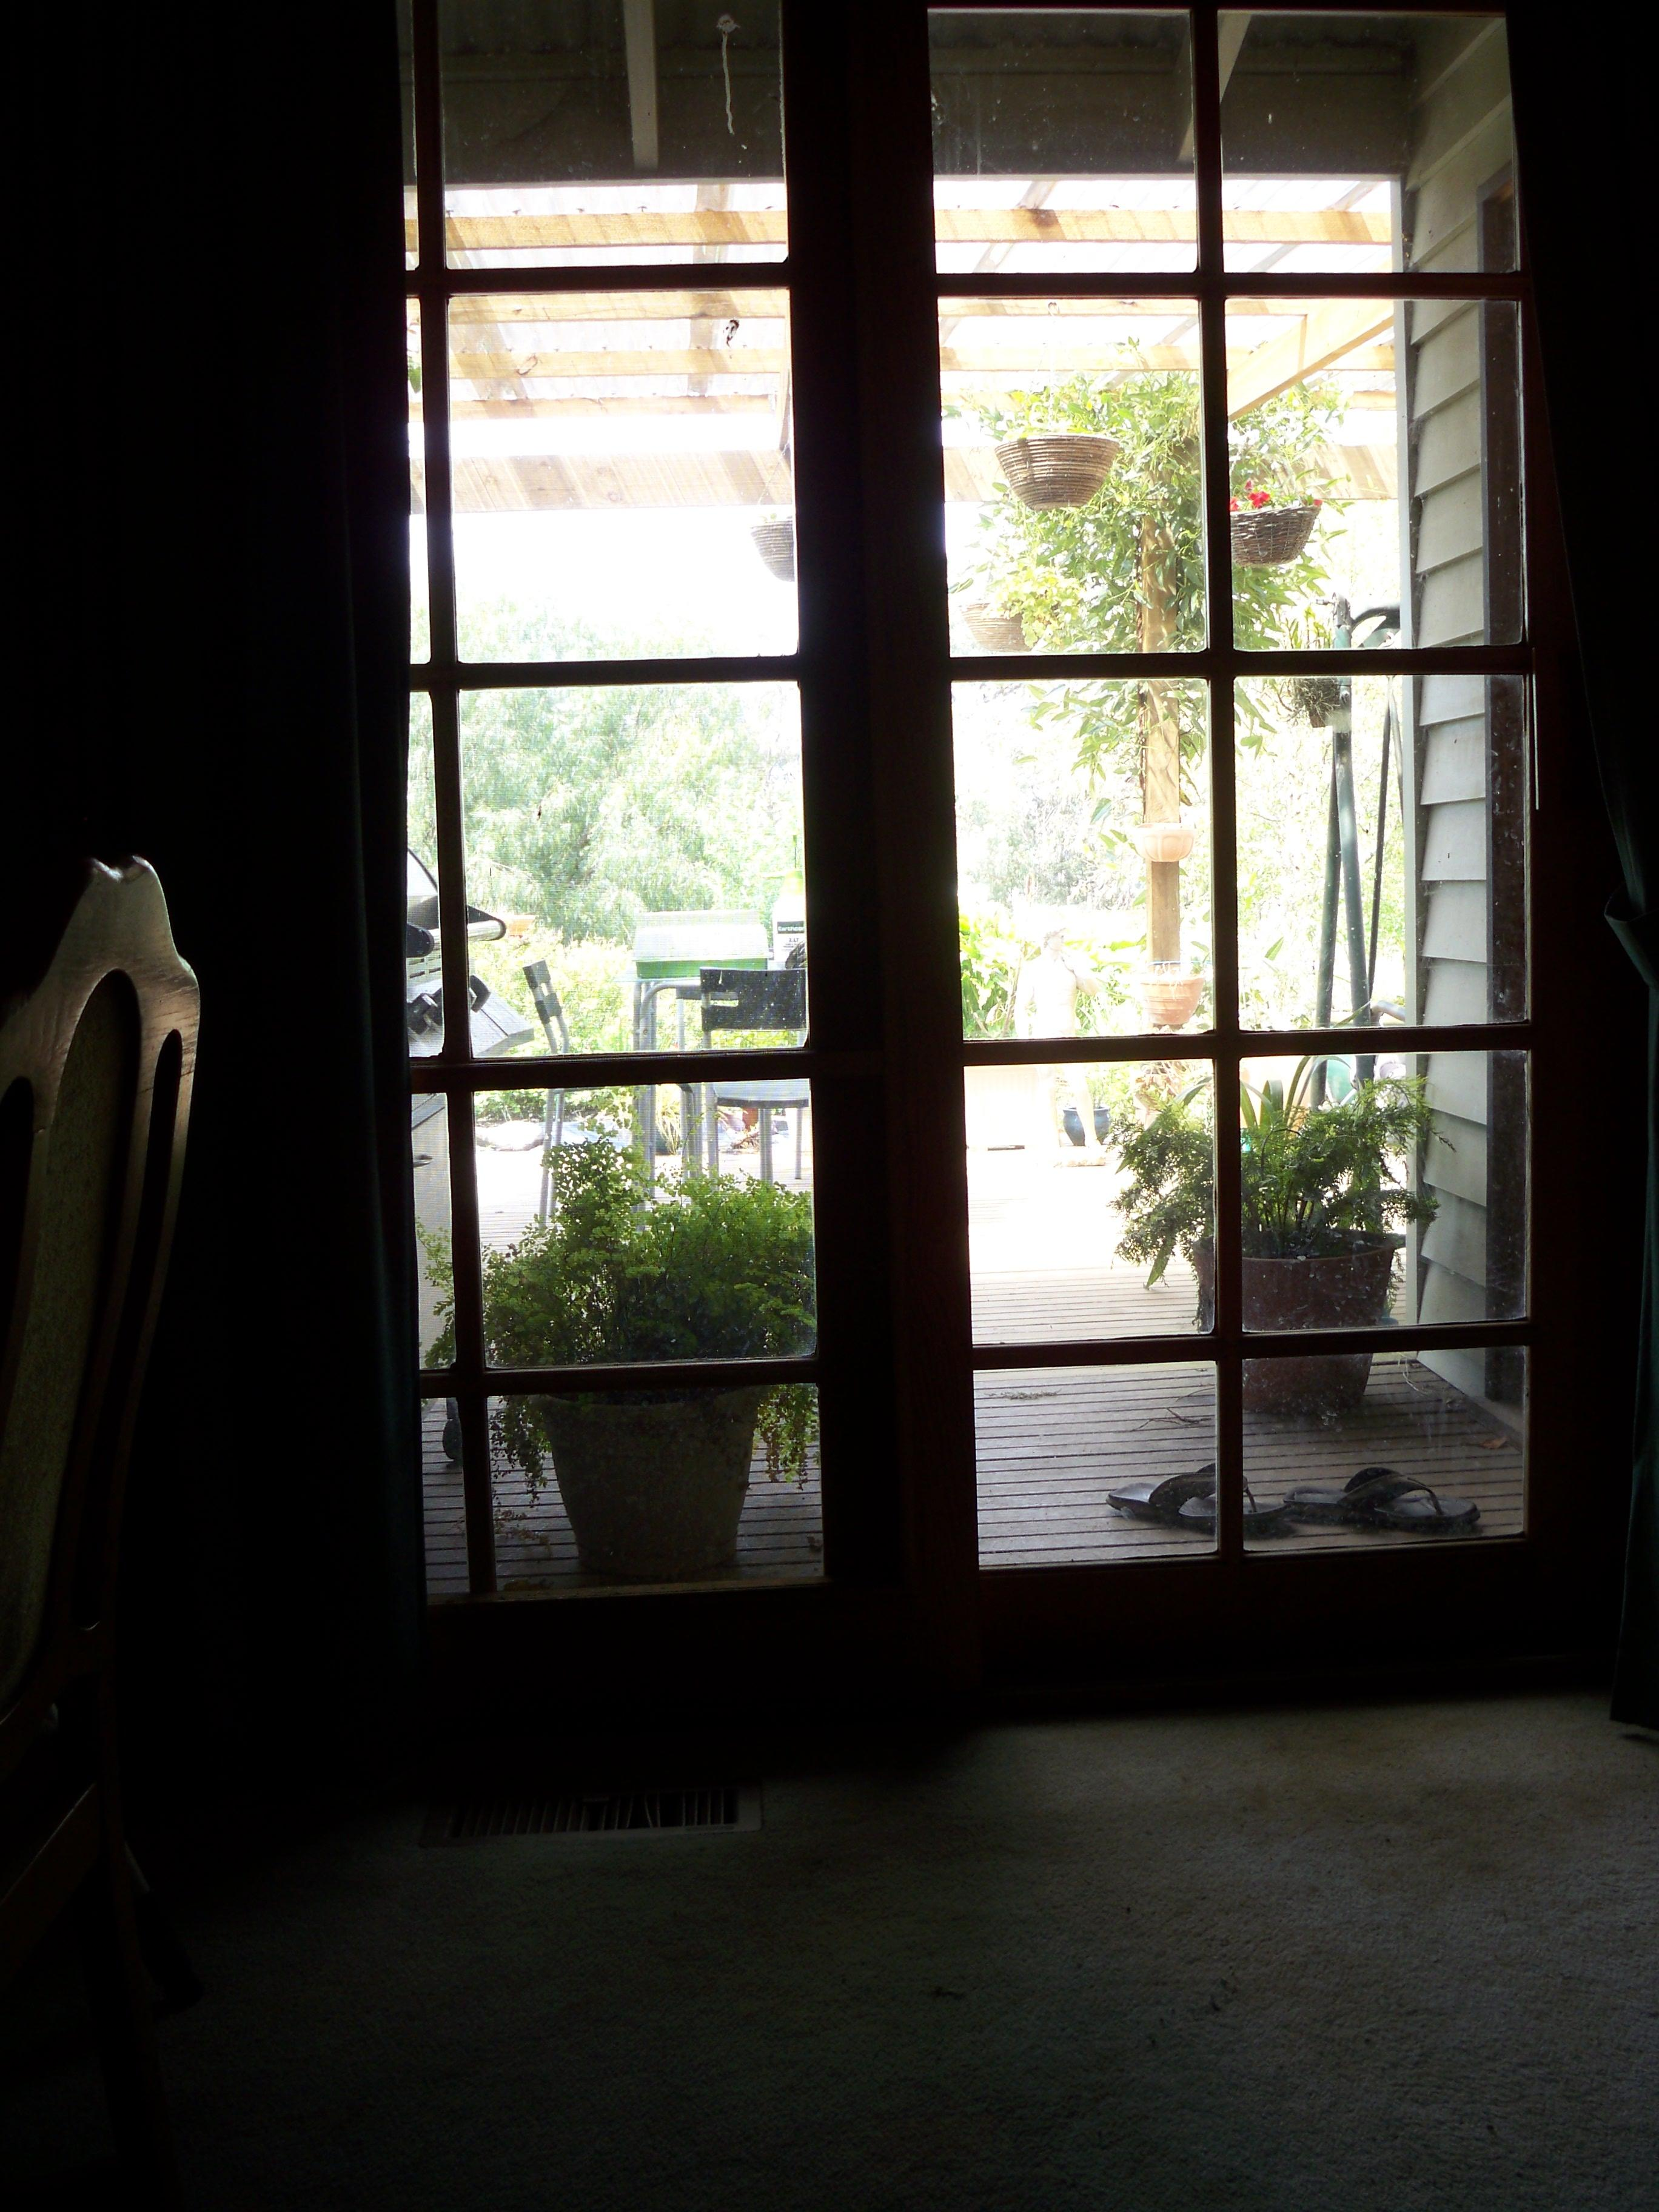 Doorway-Kodak.jpeg